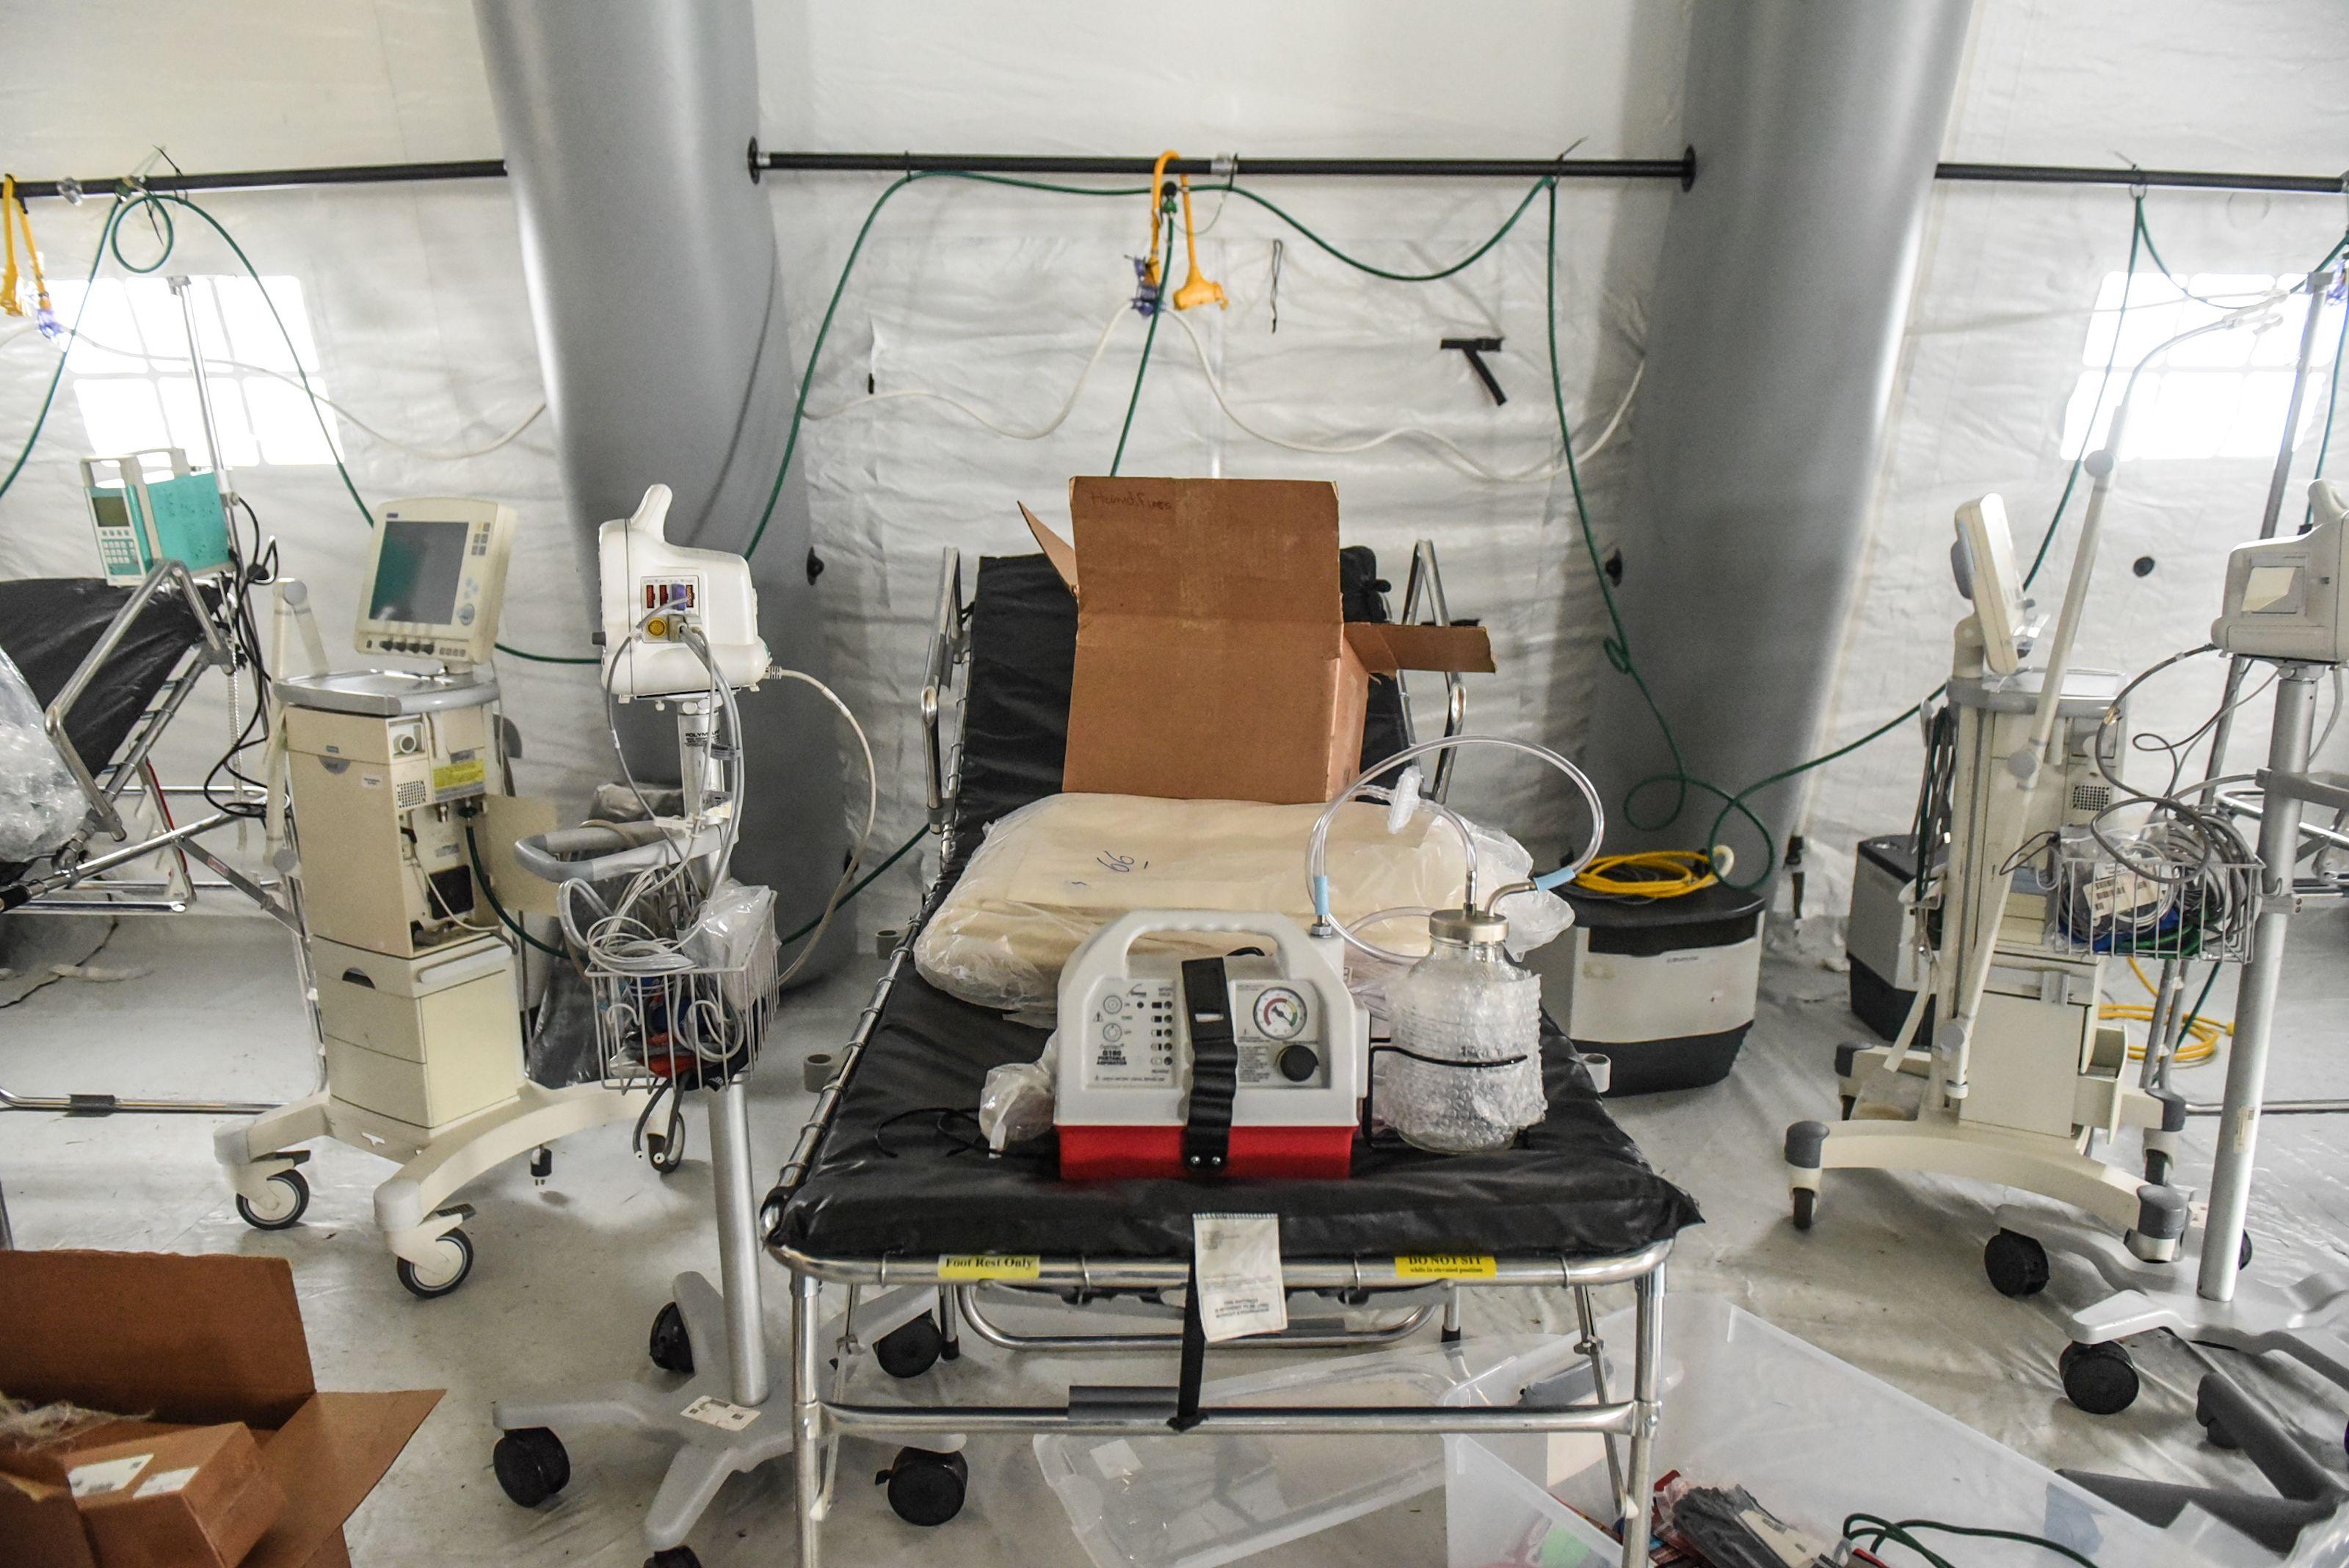 China donates 1,000 ventilators to New York